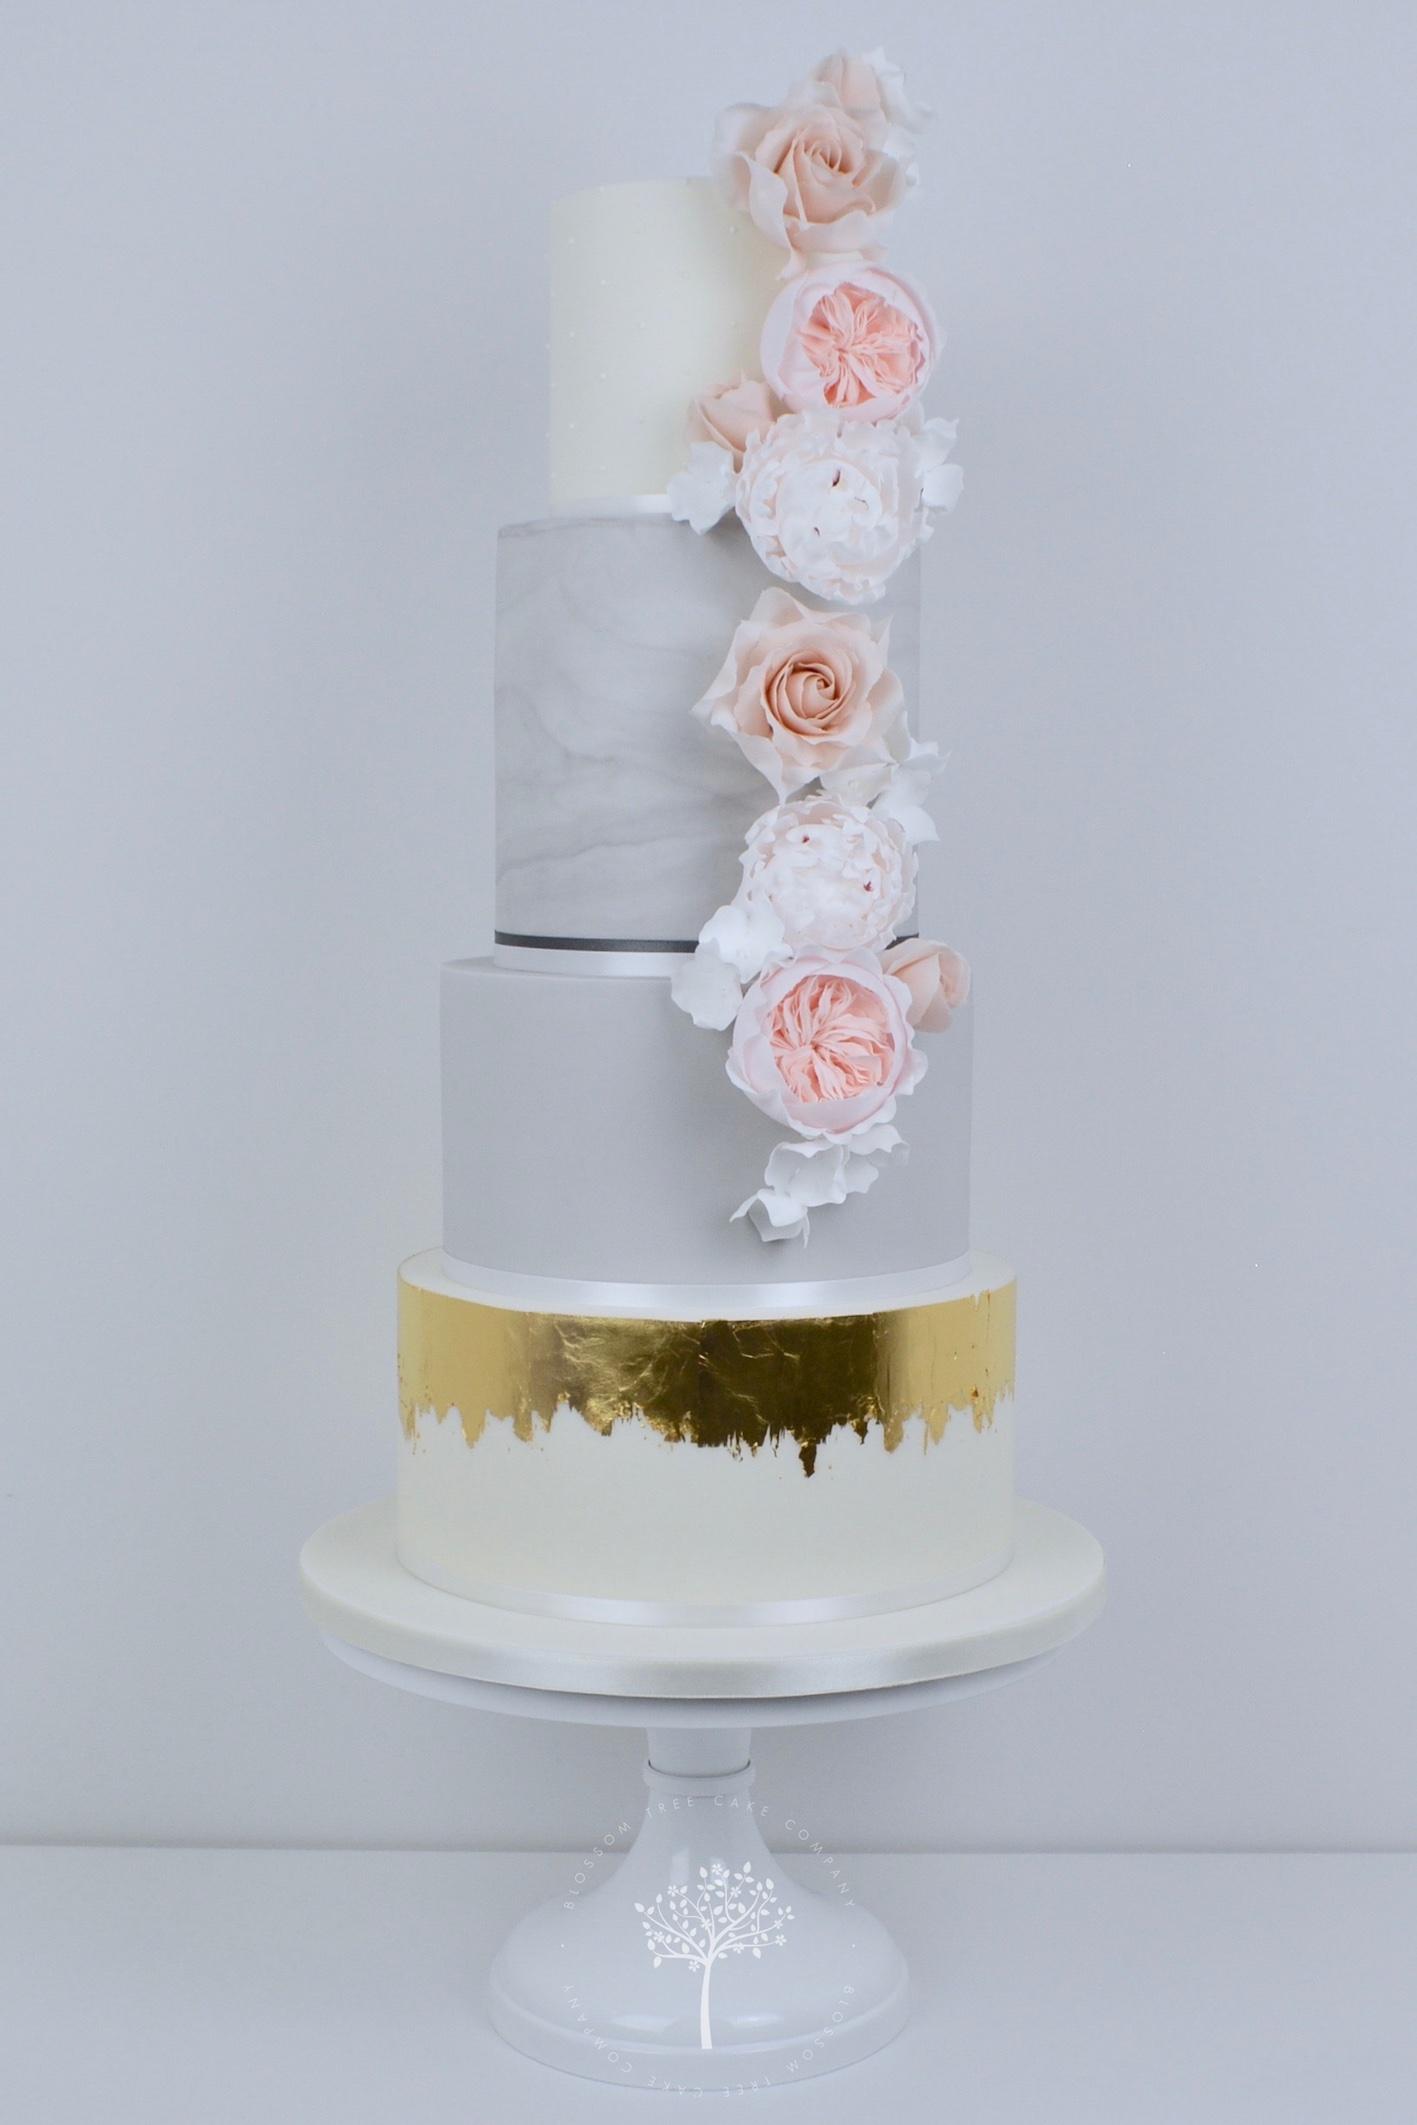 Nude Roses & Peony wedding cake by Blossom Tree Cake Company Harrogate North Yorkshire.jpg